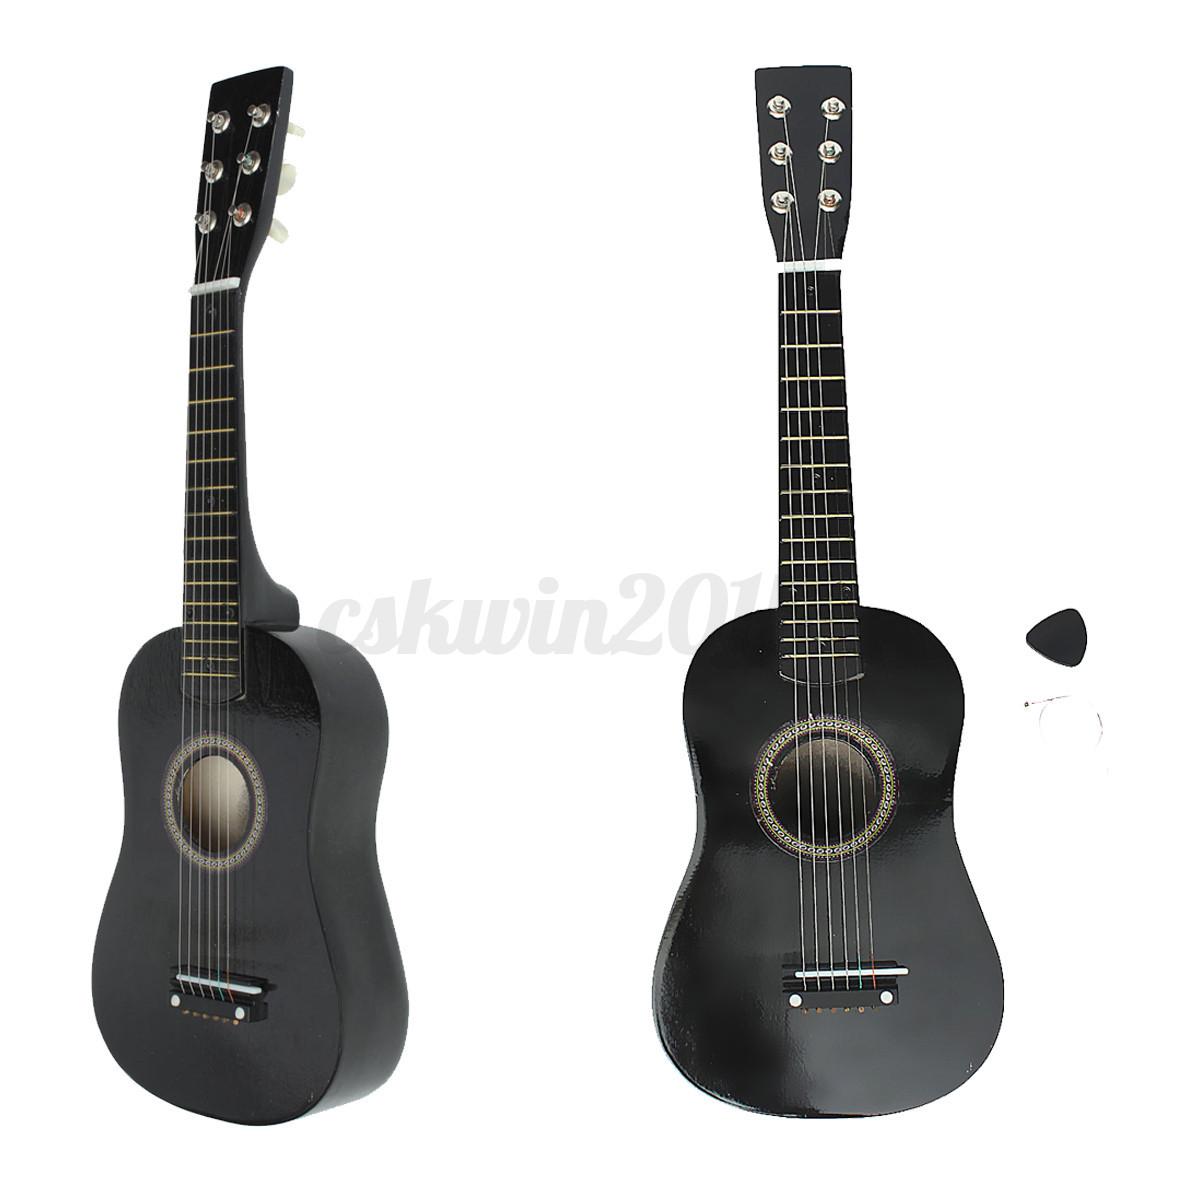 23 6 strings popular beginners kids basswood acoustic guitar pick wire strings ebay. Black Bedroom Furniture Sets. Home Design Ideas